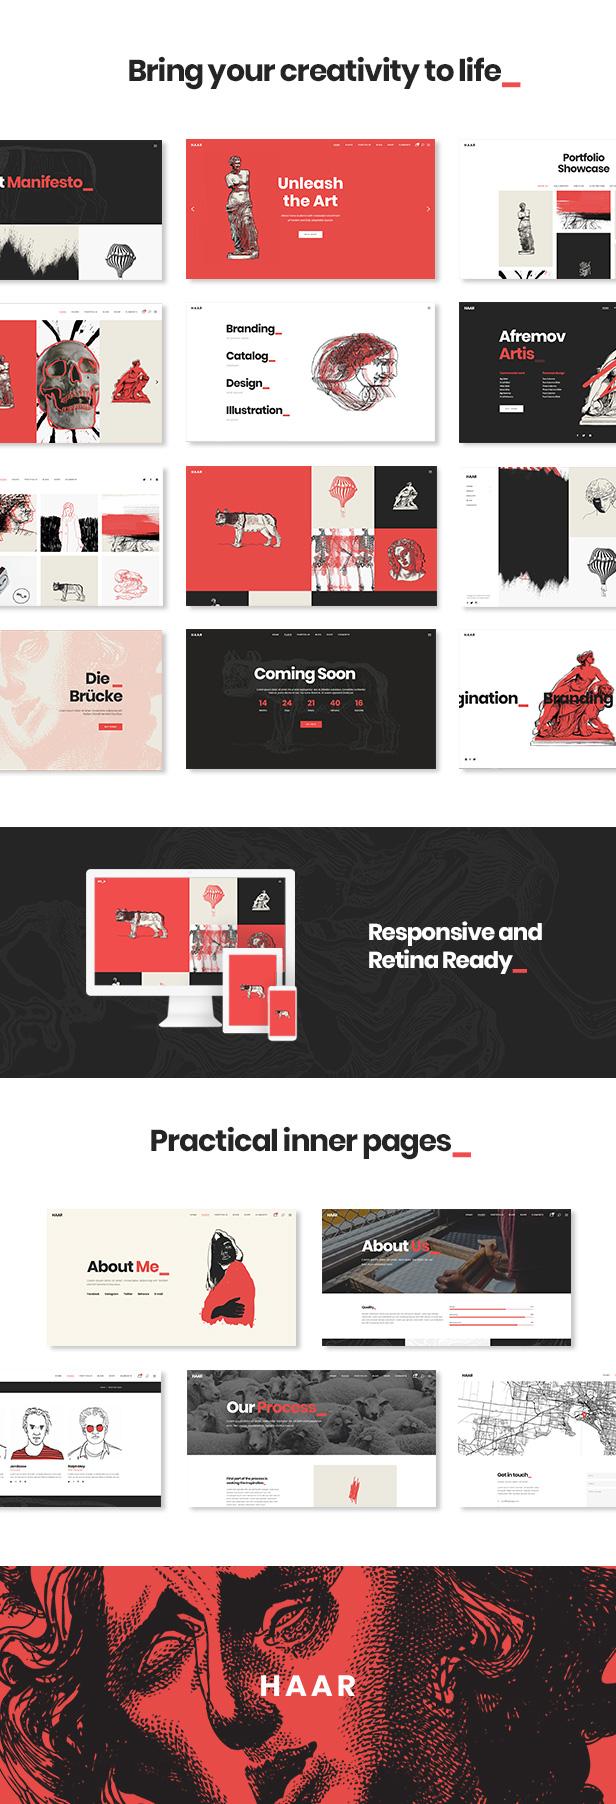 Haar - Portfolio Theme for Designers, Artists and Illustrators - 1